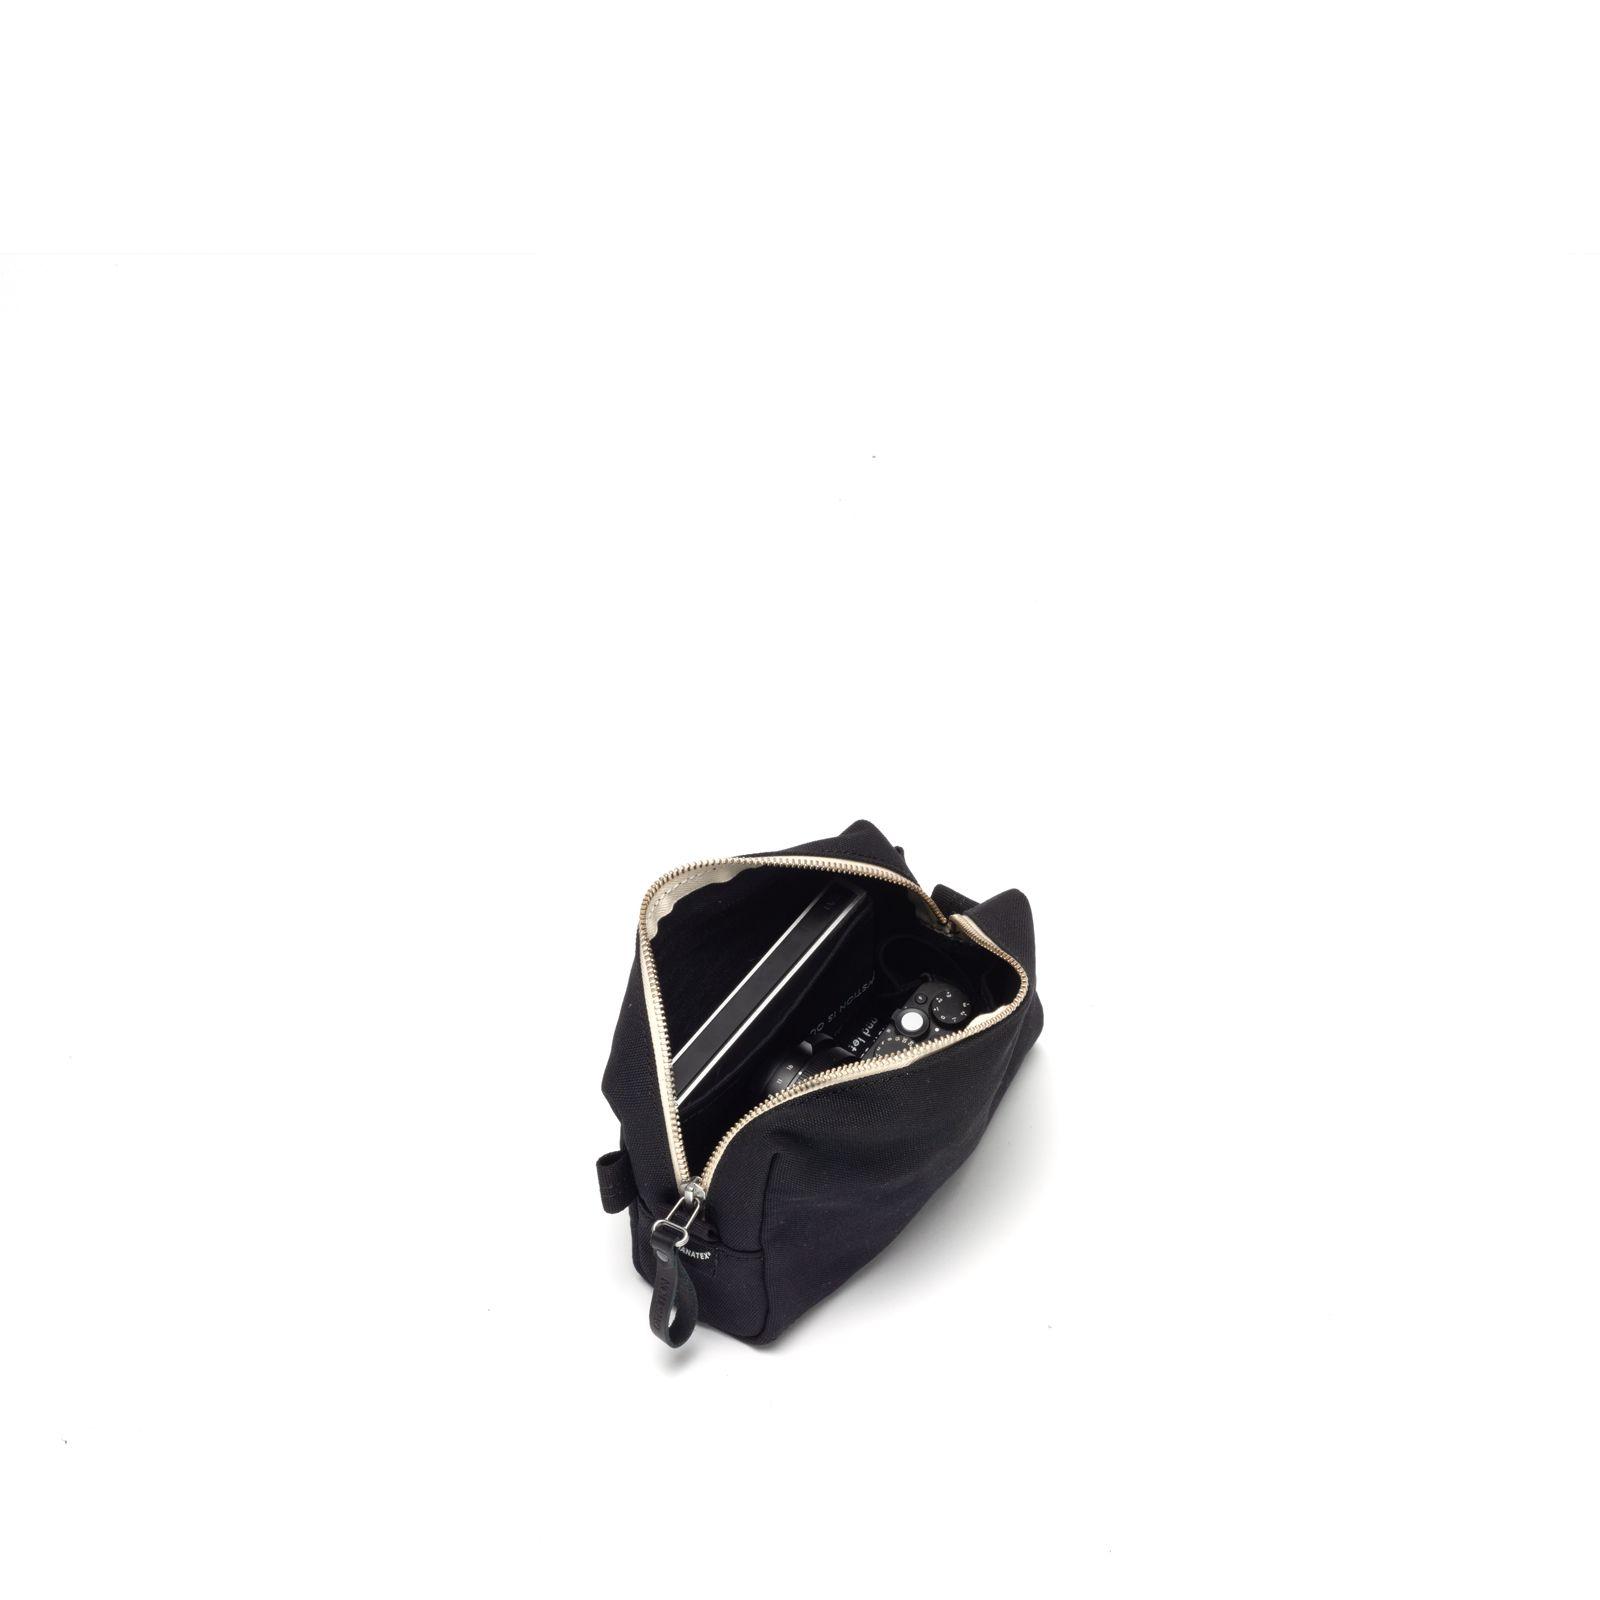 Hip Pouch / Bananatex® (All Black) - All Black